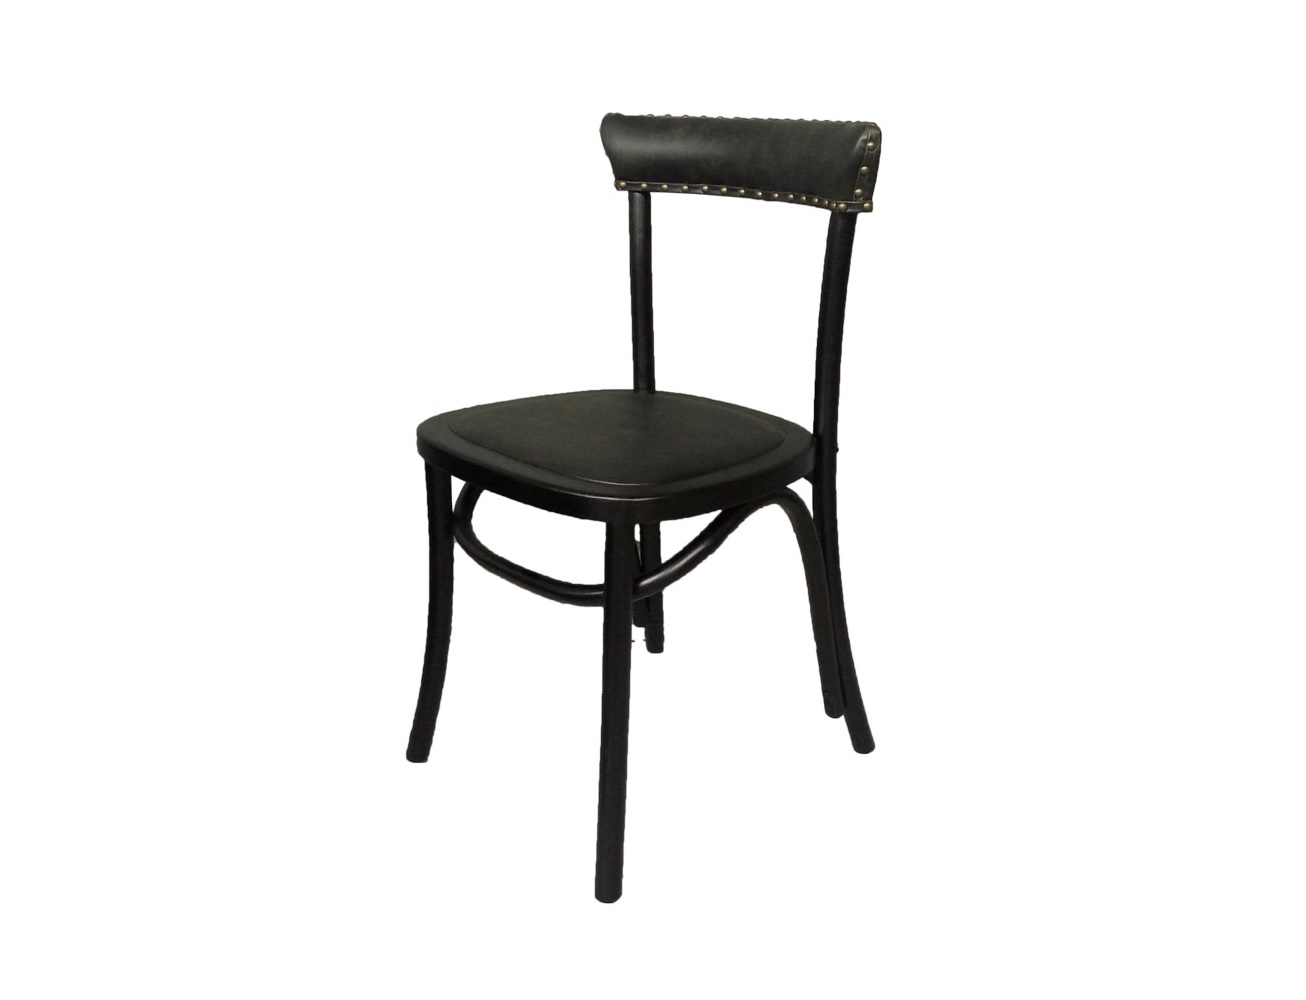 Стул Lark Side ChairОбеденные стулья<br><br><br>Material: Дерево<br>Width см: 51<br>Depth см: 58<br>Height см: 112